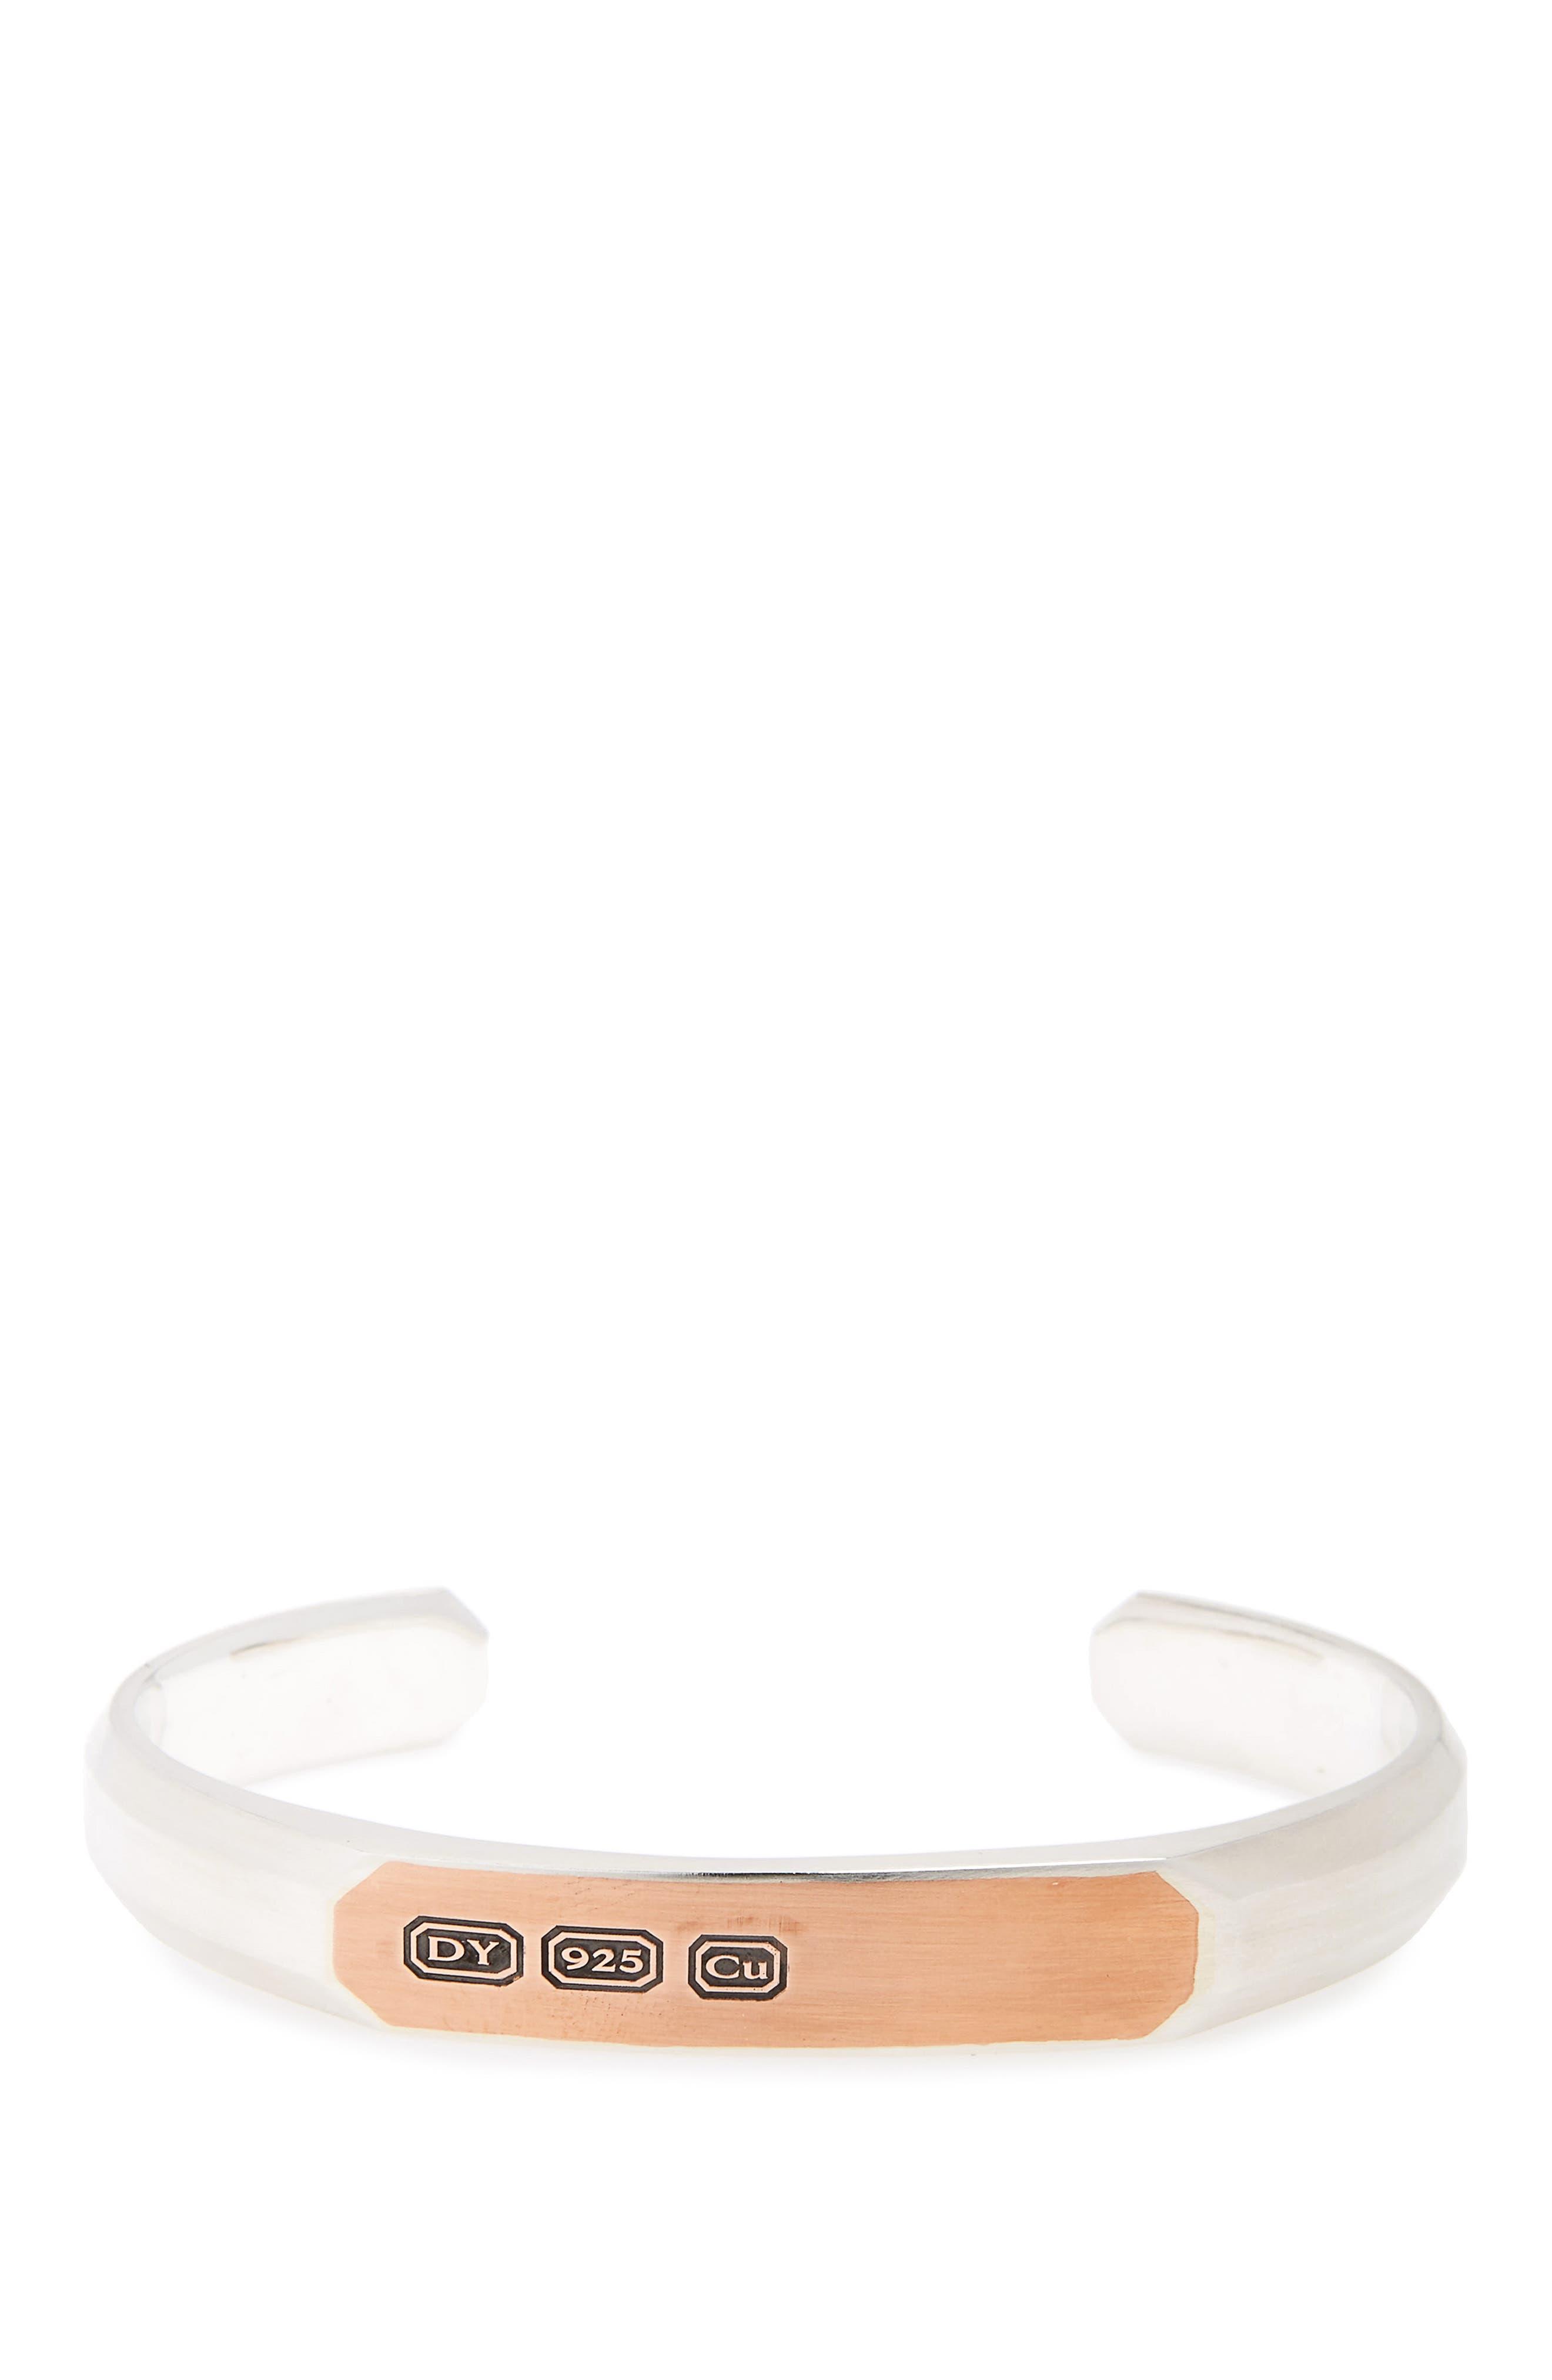 Heirloom Streamline Cuff Bracelet,                         Main,                         color, SILVER/ COPPER